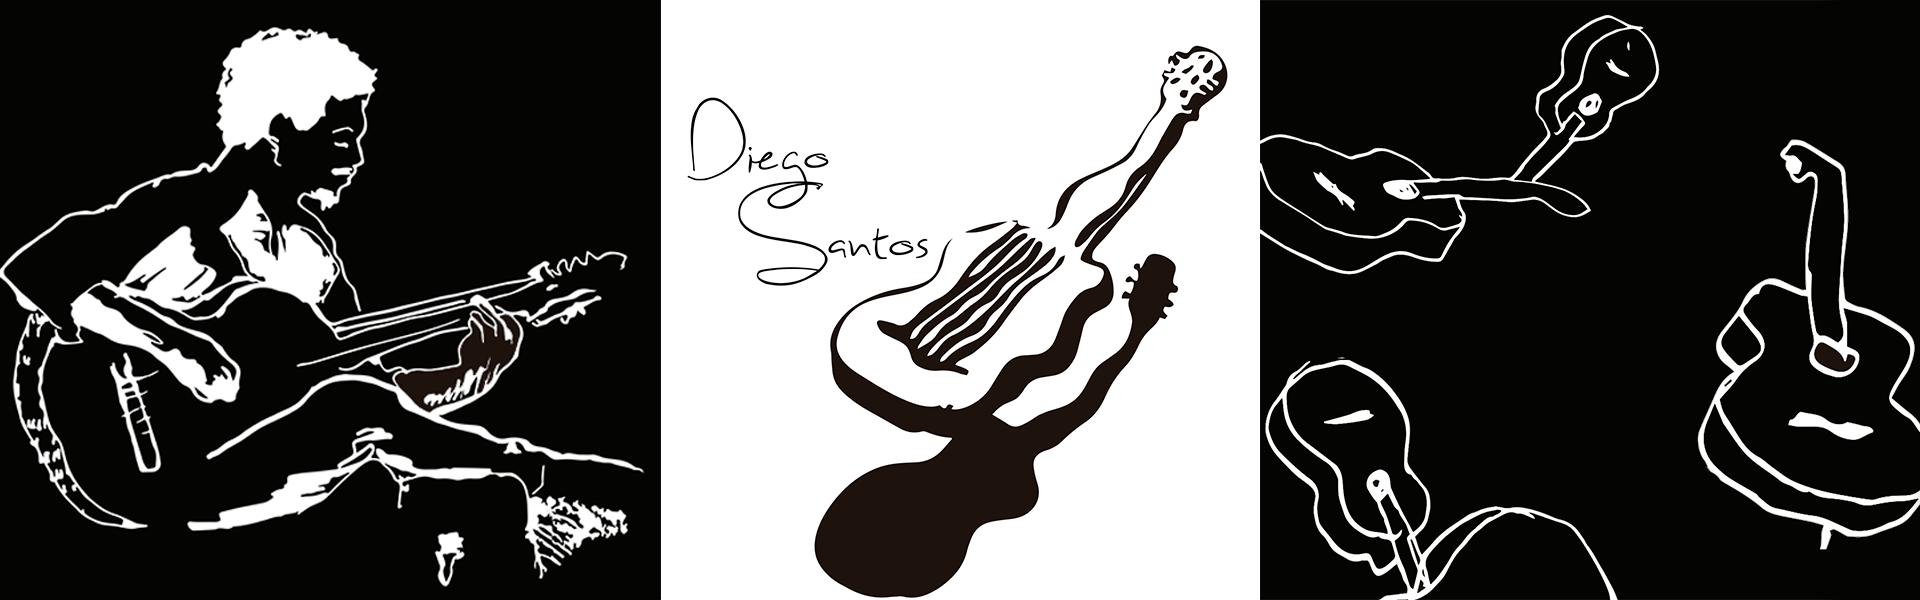 Diego Santos